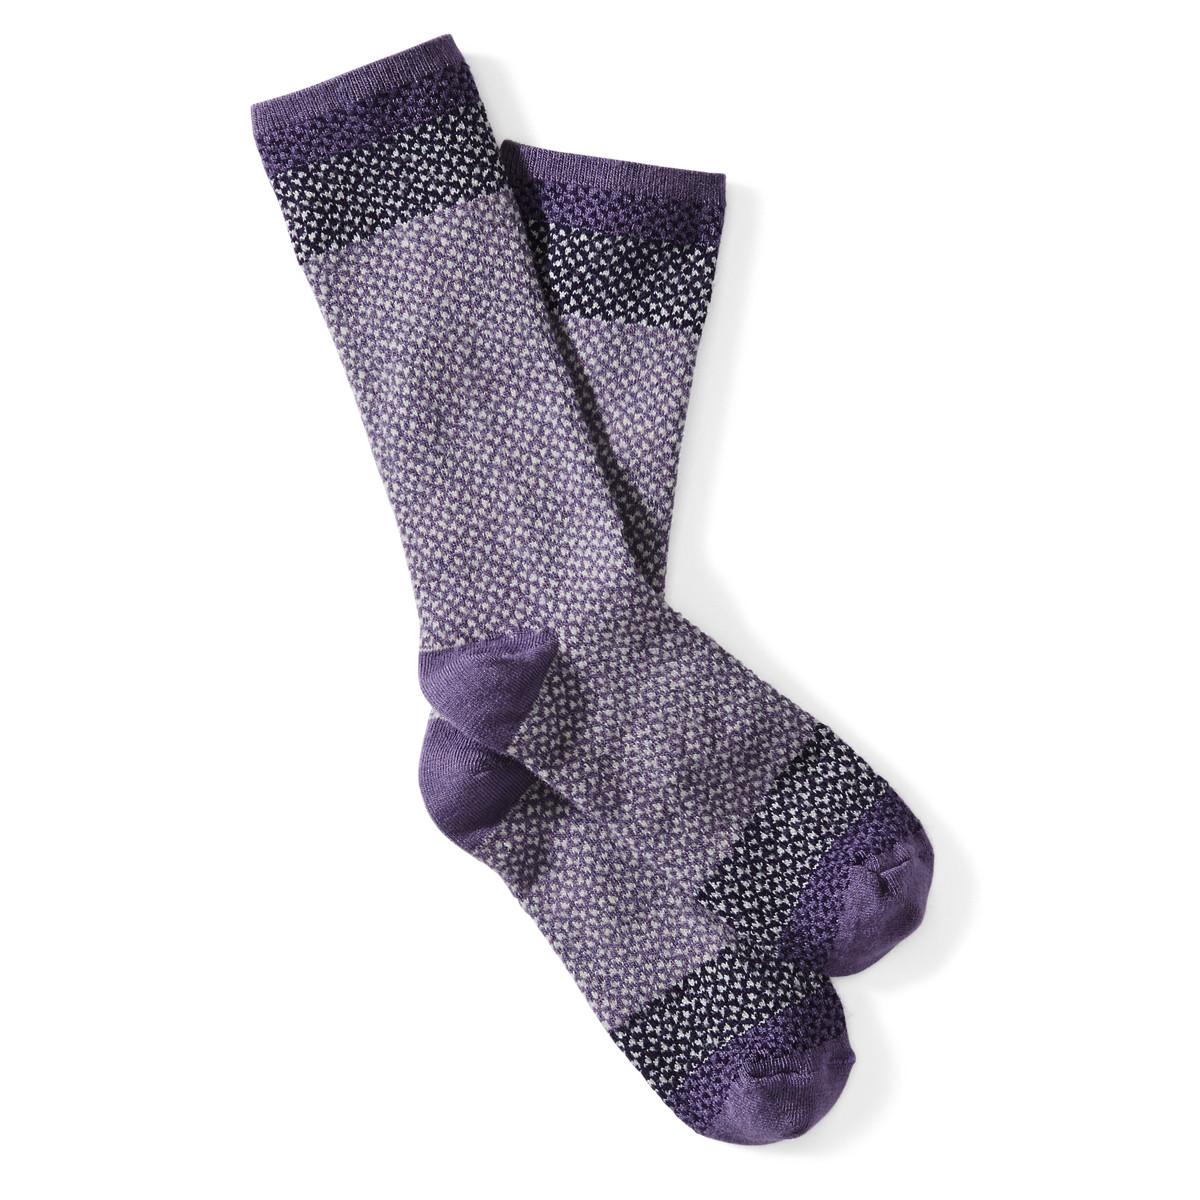 Goodhew Women's Bowtie Sock - Plum